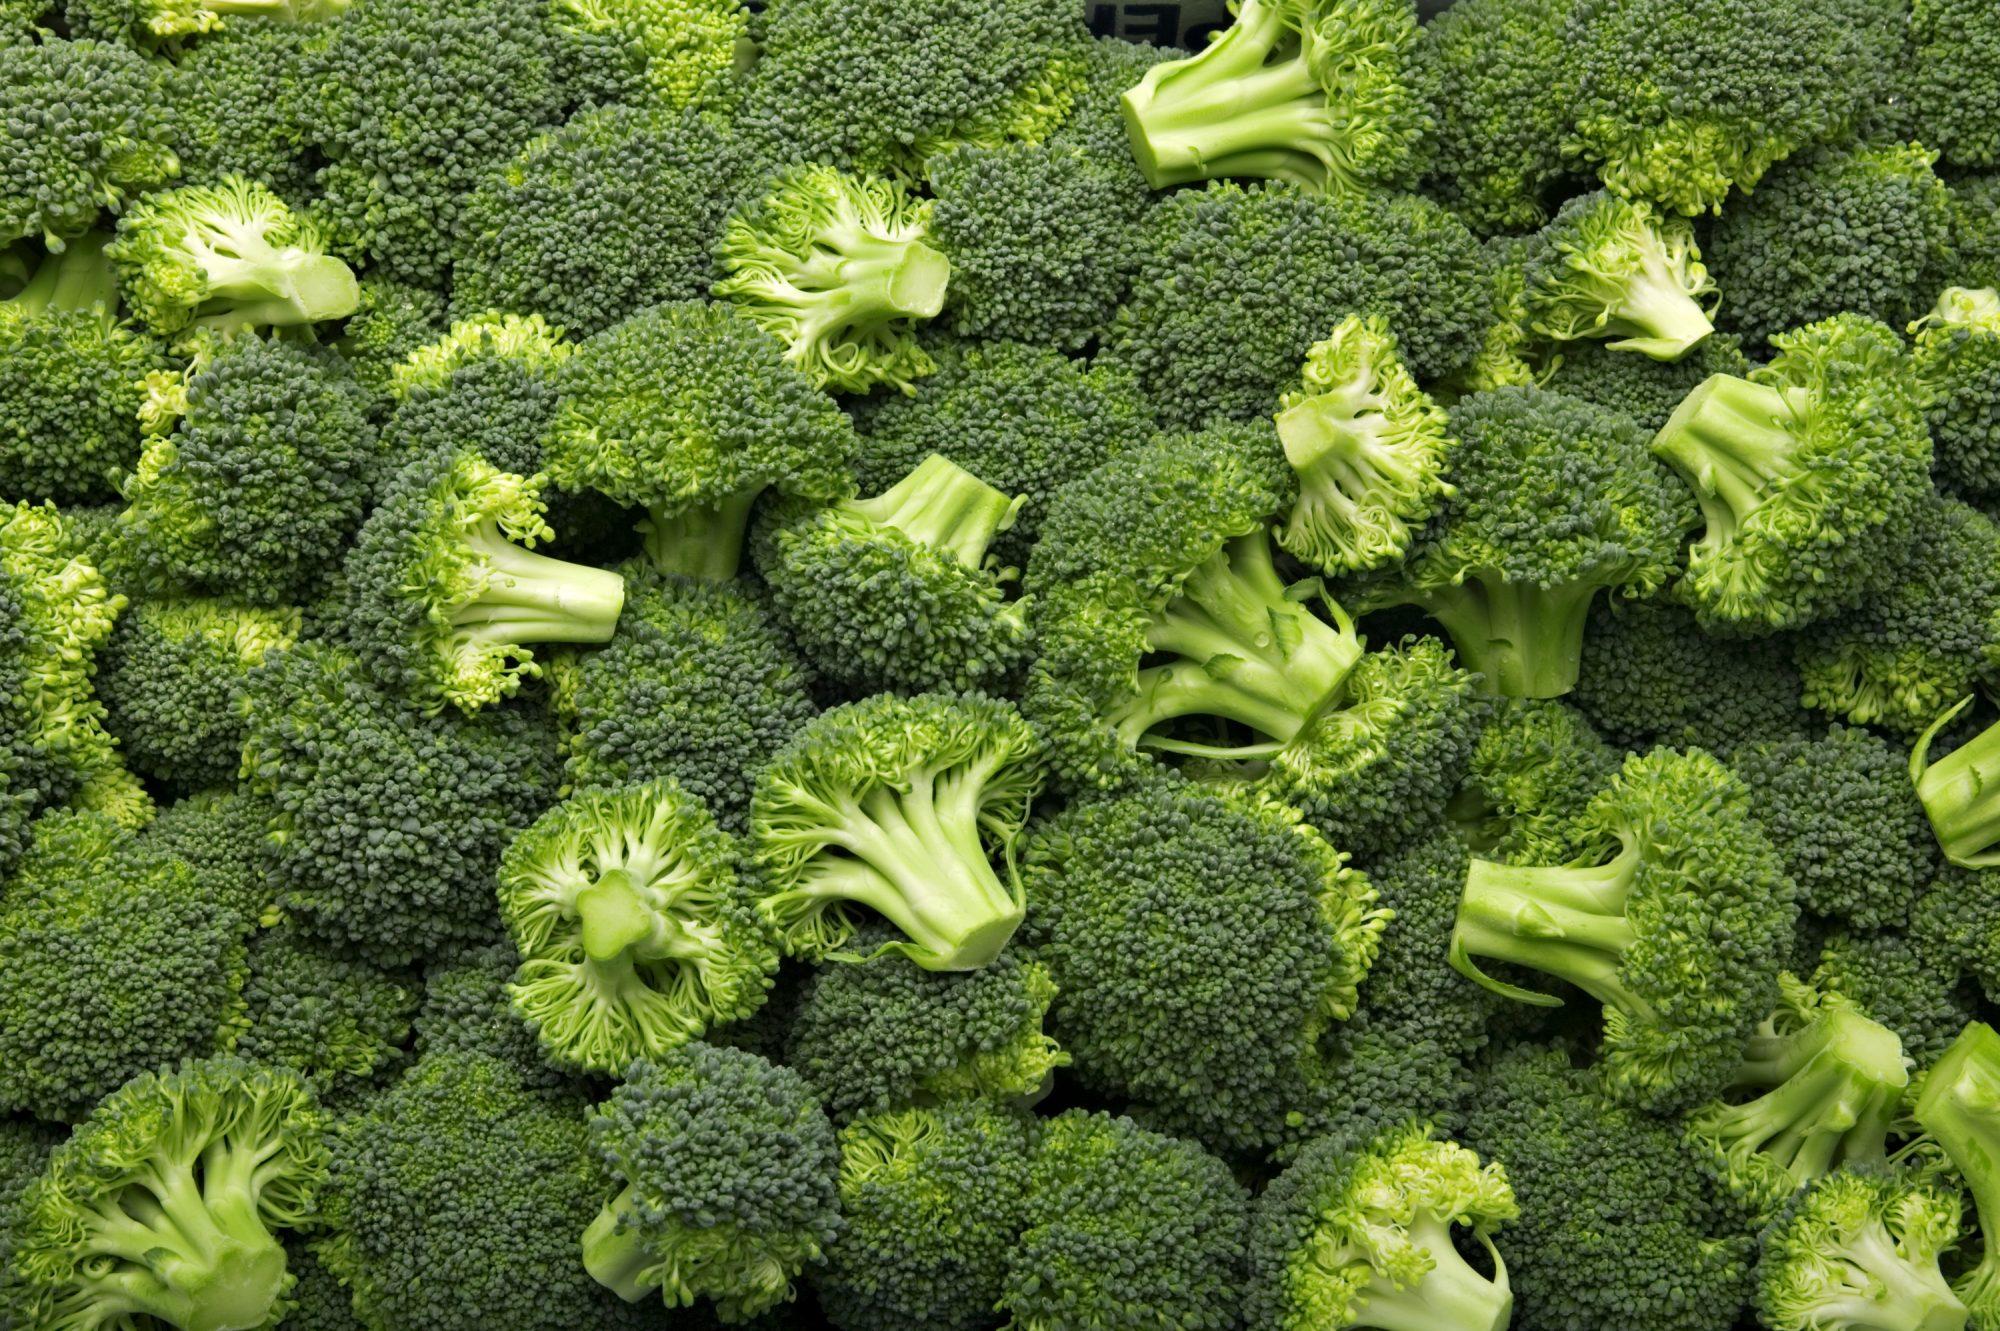 Broccoli Florets Getty 4/29/20